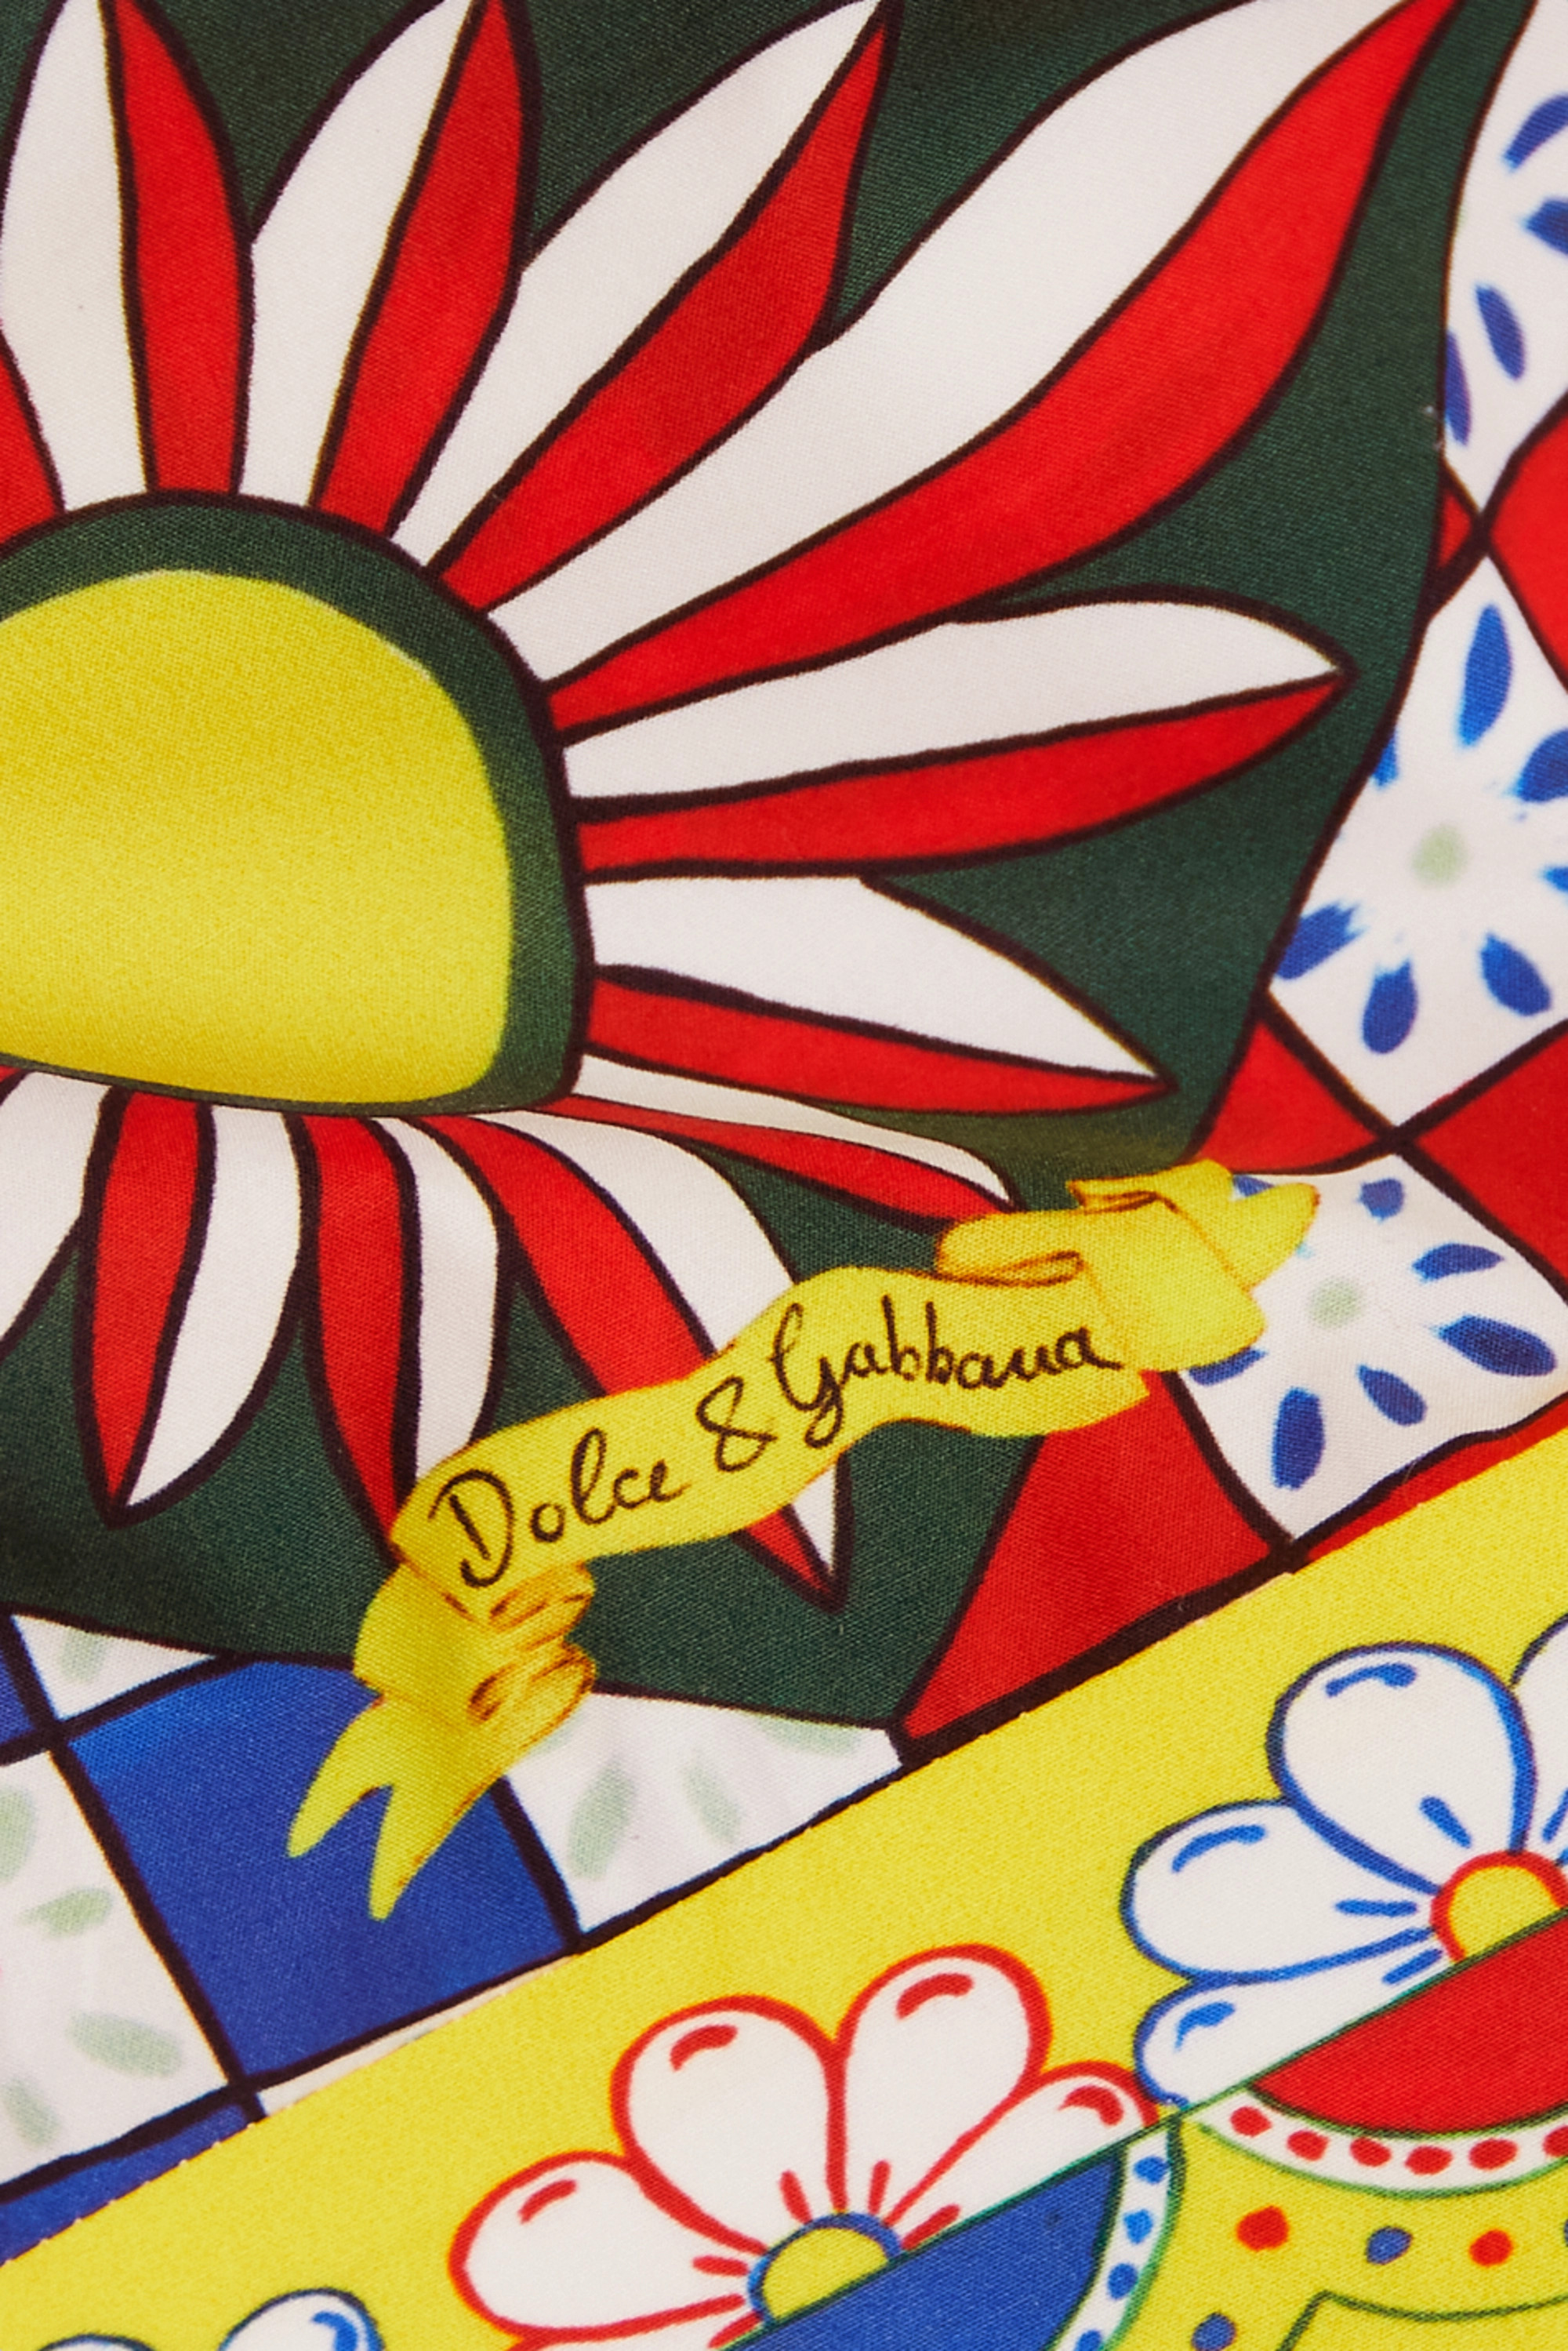 Dolce & Gabbana Haut raccourci en popeline de coton imprimée